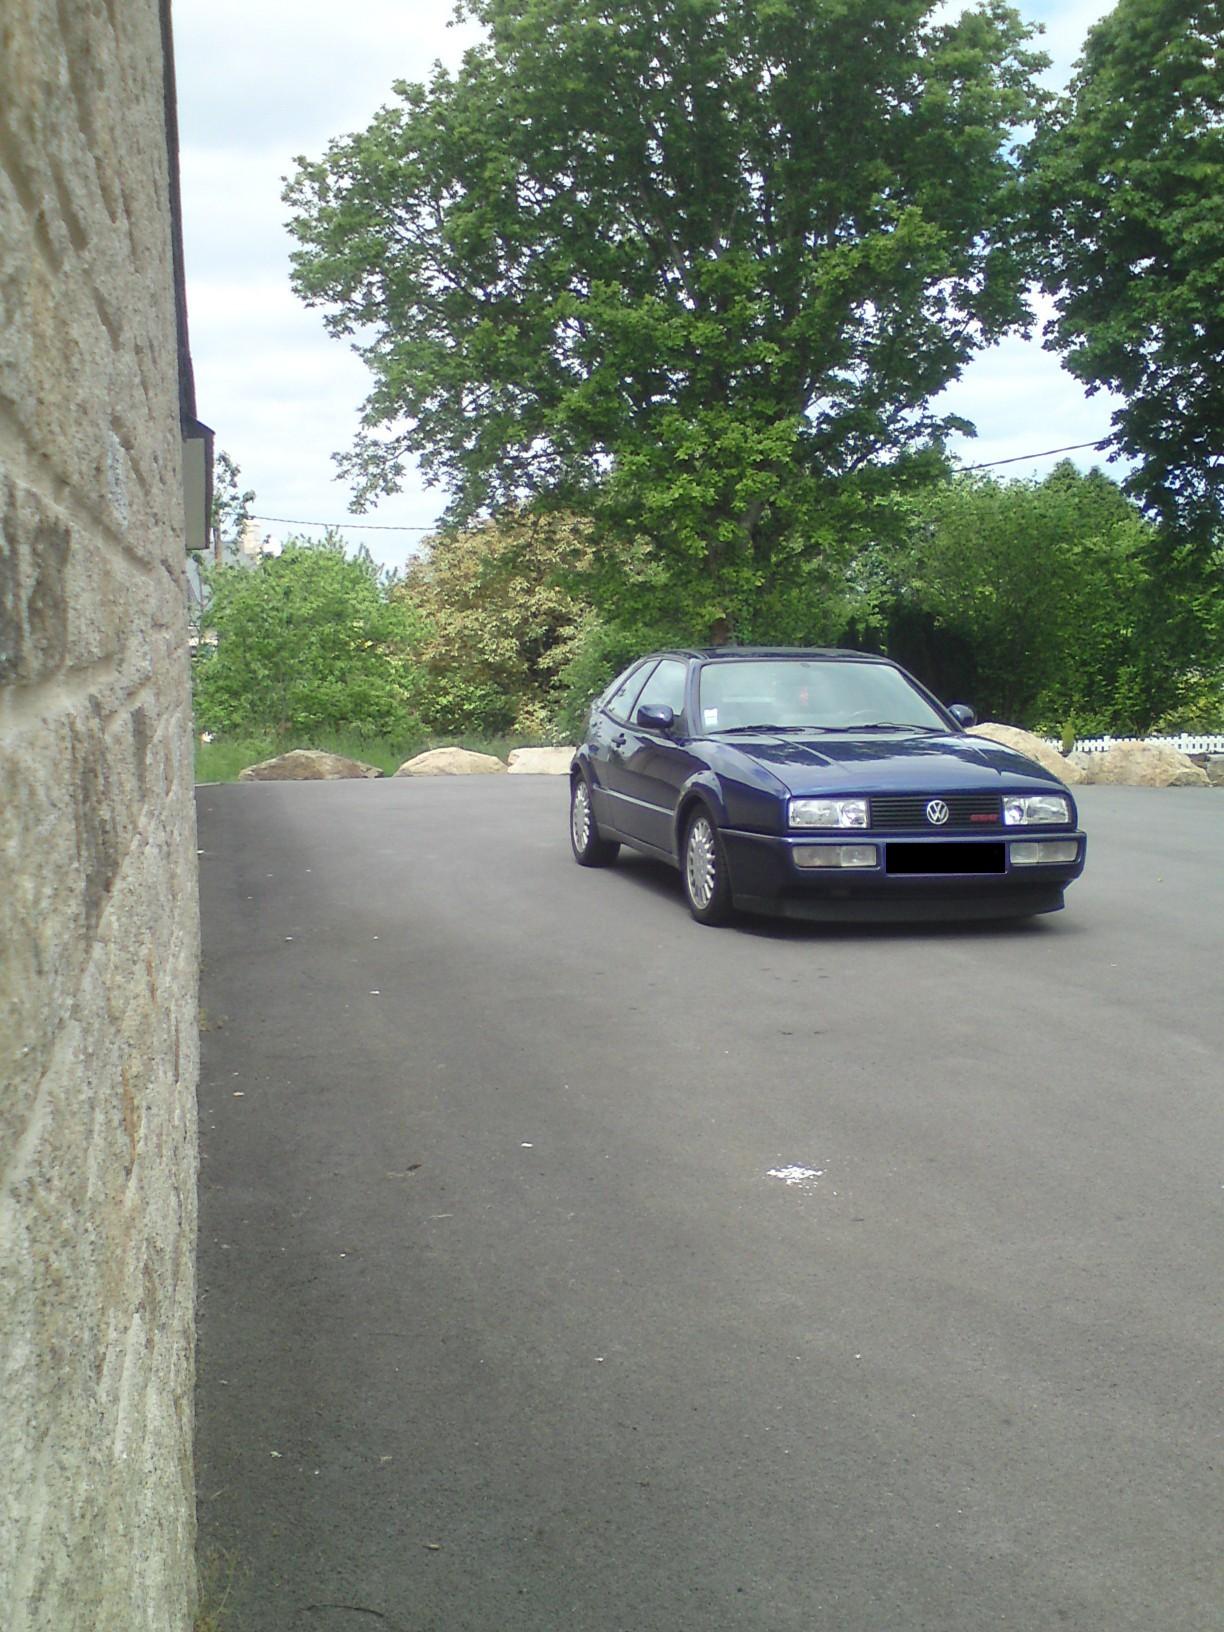 [Corrado] G60 allemand ... Deutch Import ... - Page 2 Dsc05651gy